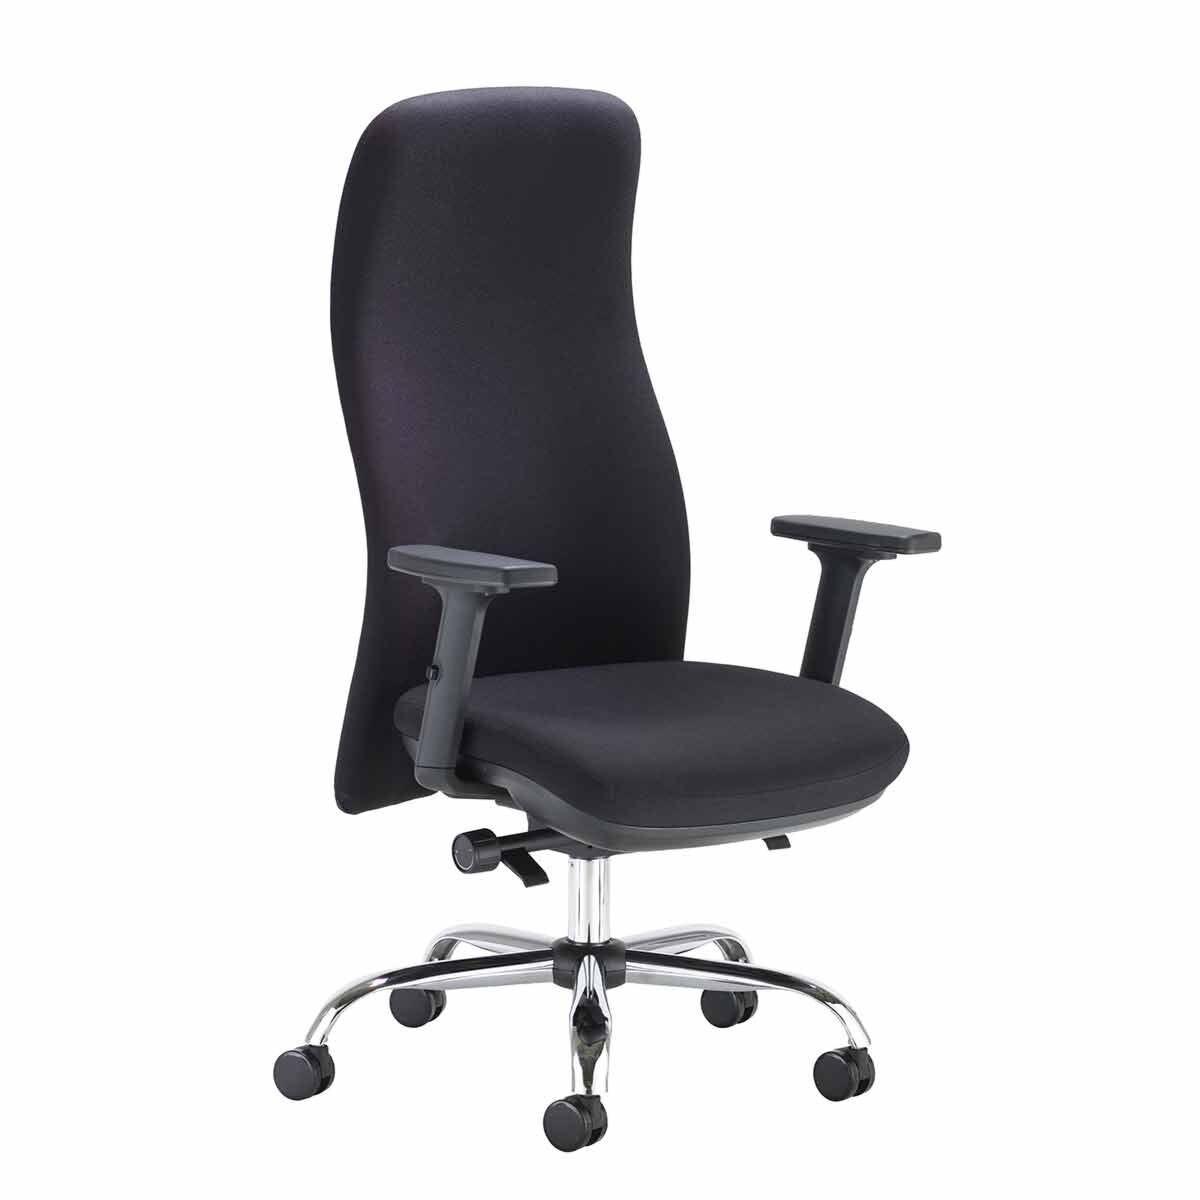 TC Office Ergonomic Posture Chair Black